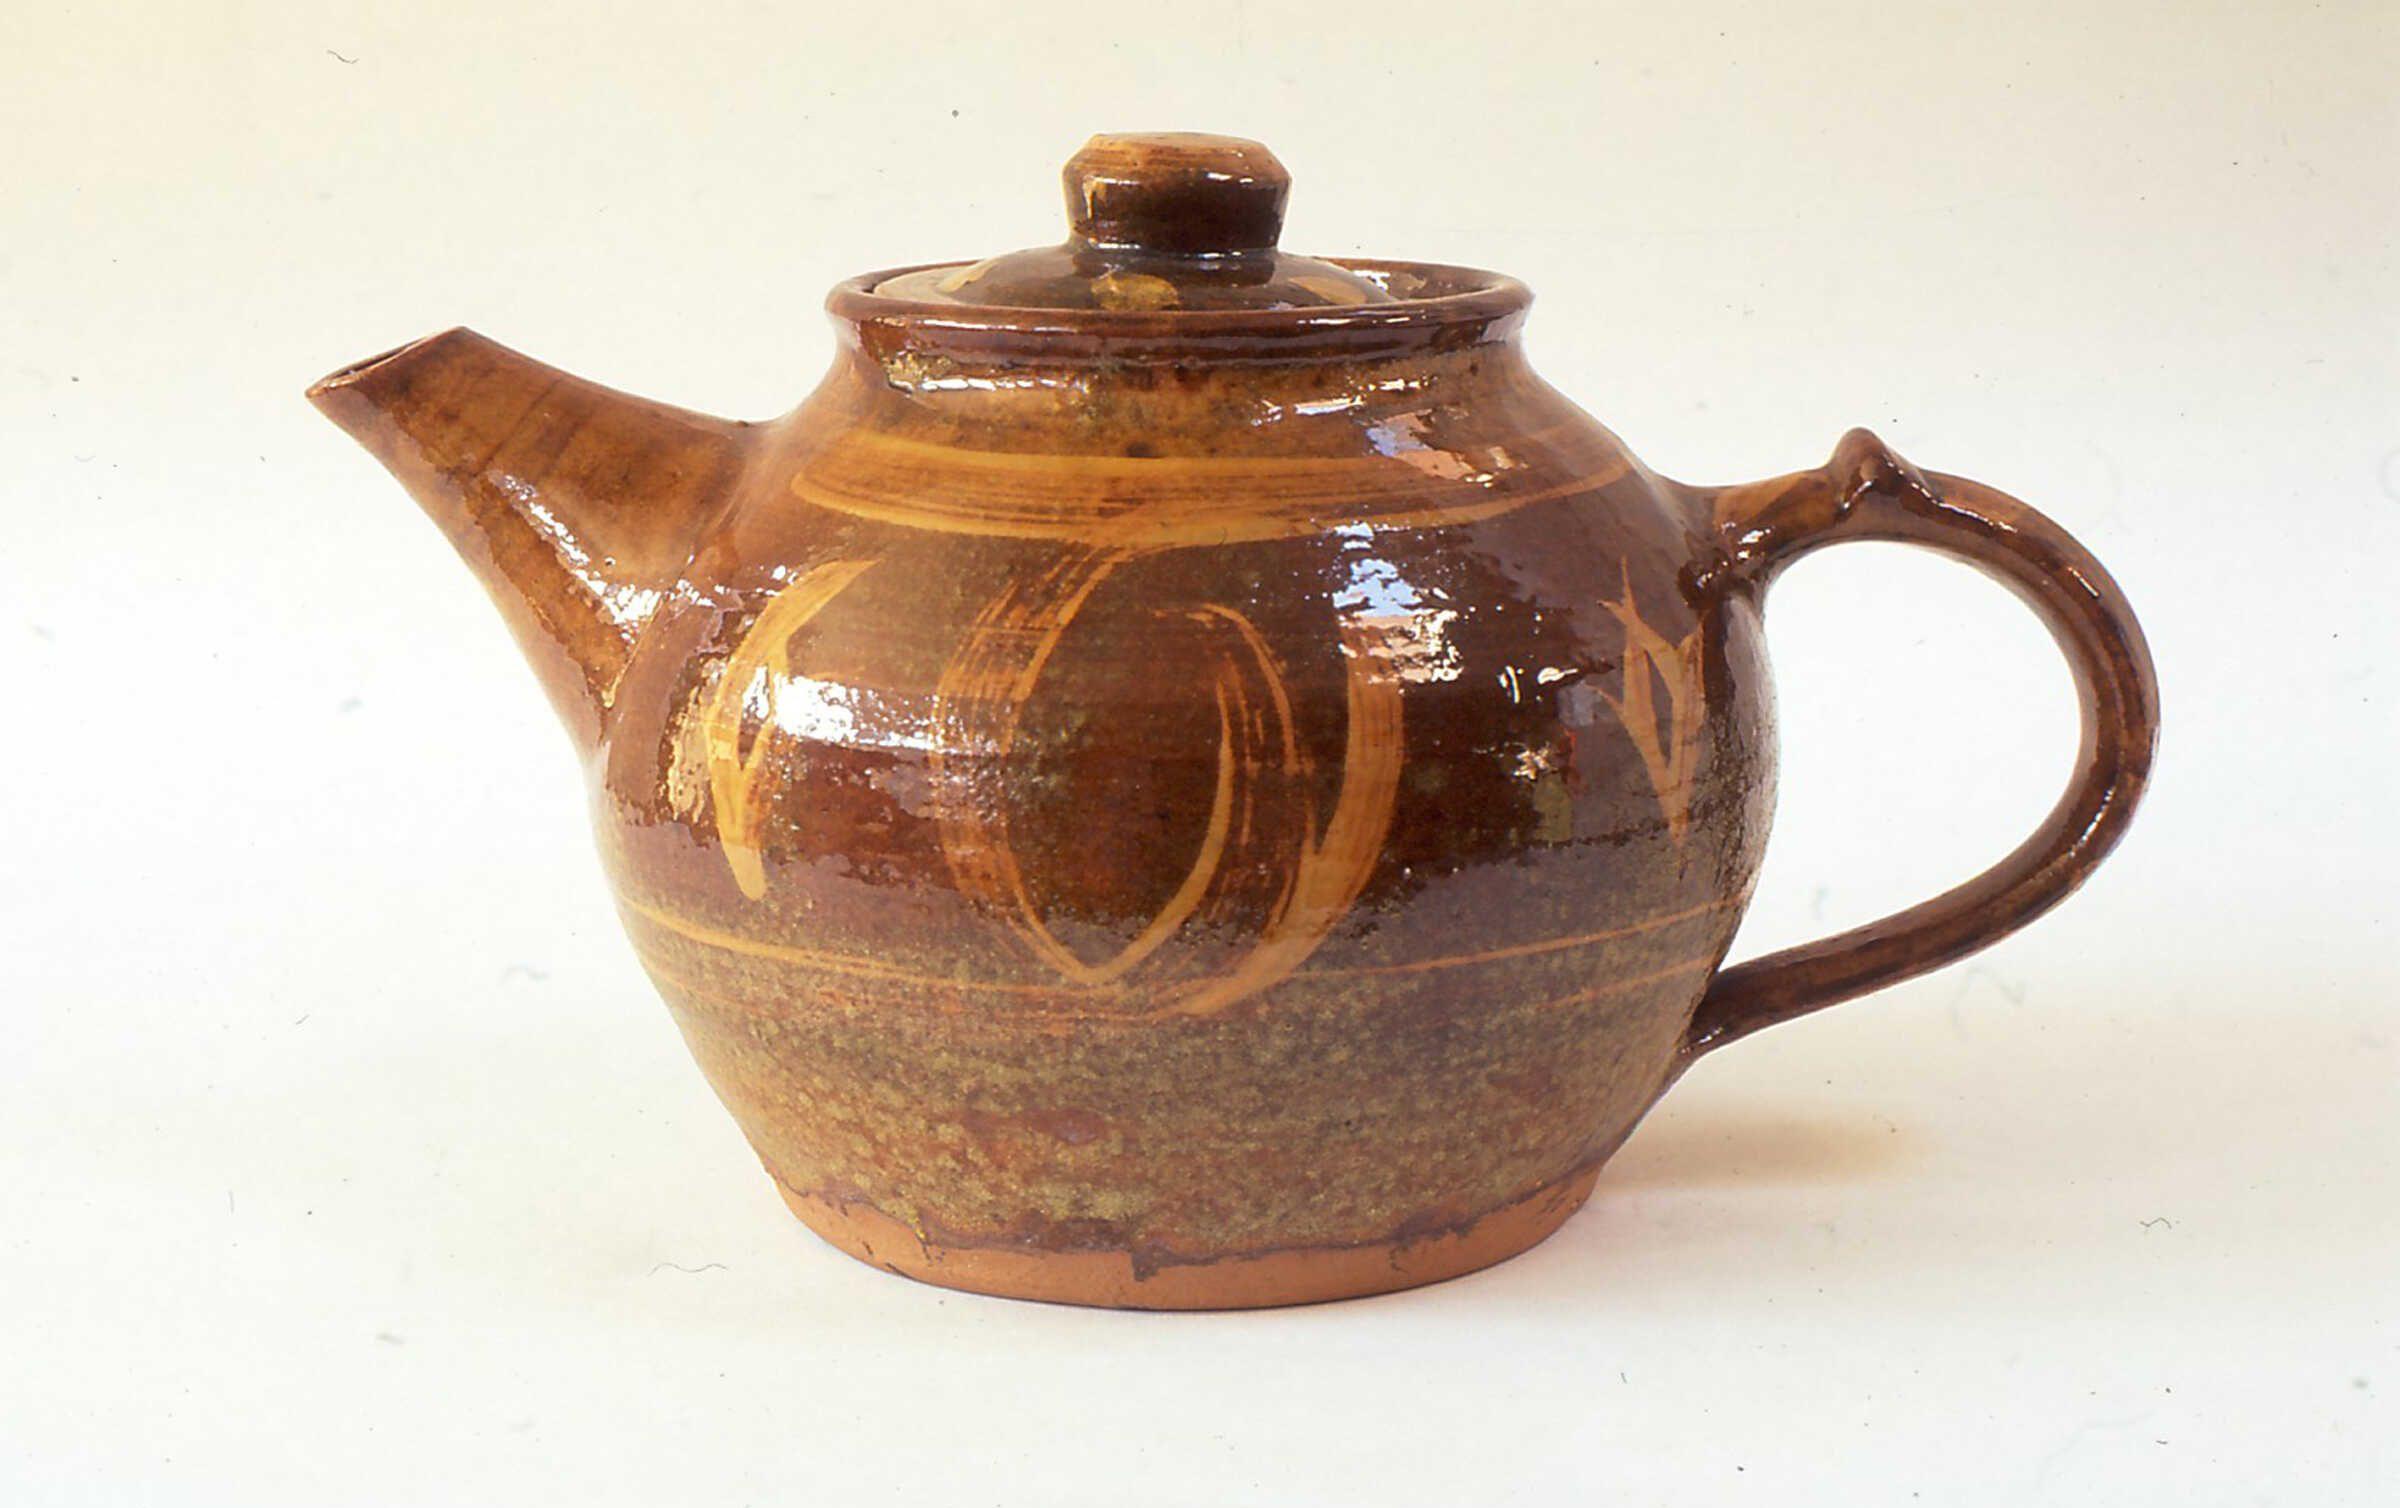 winchcombe-teapot--(richard-c-b)_optimized